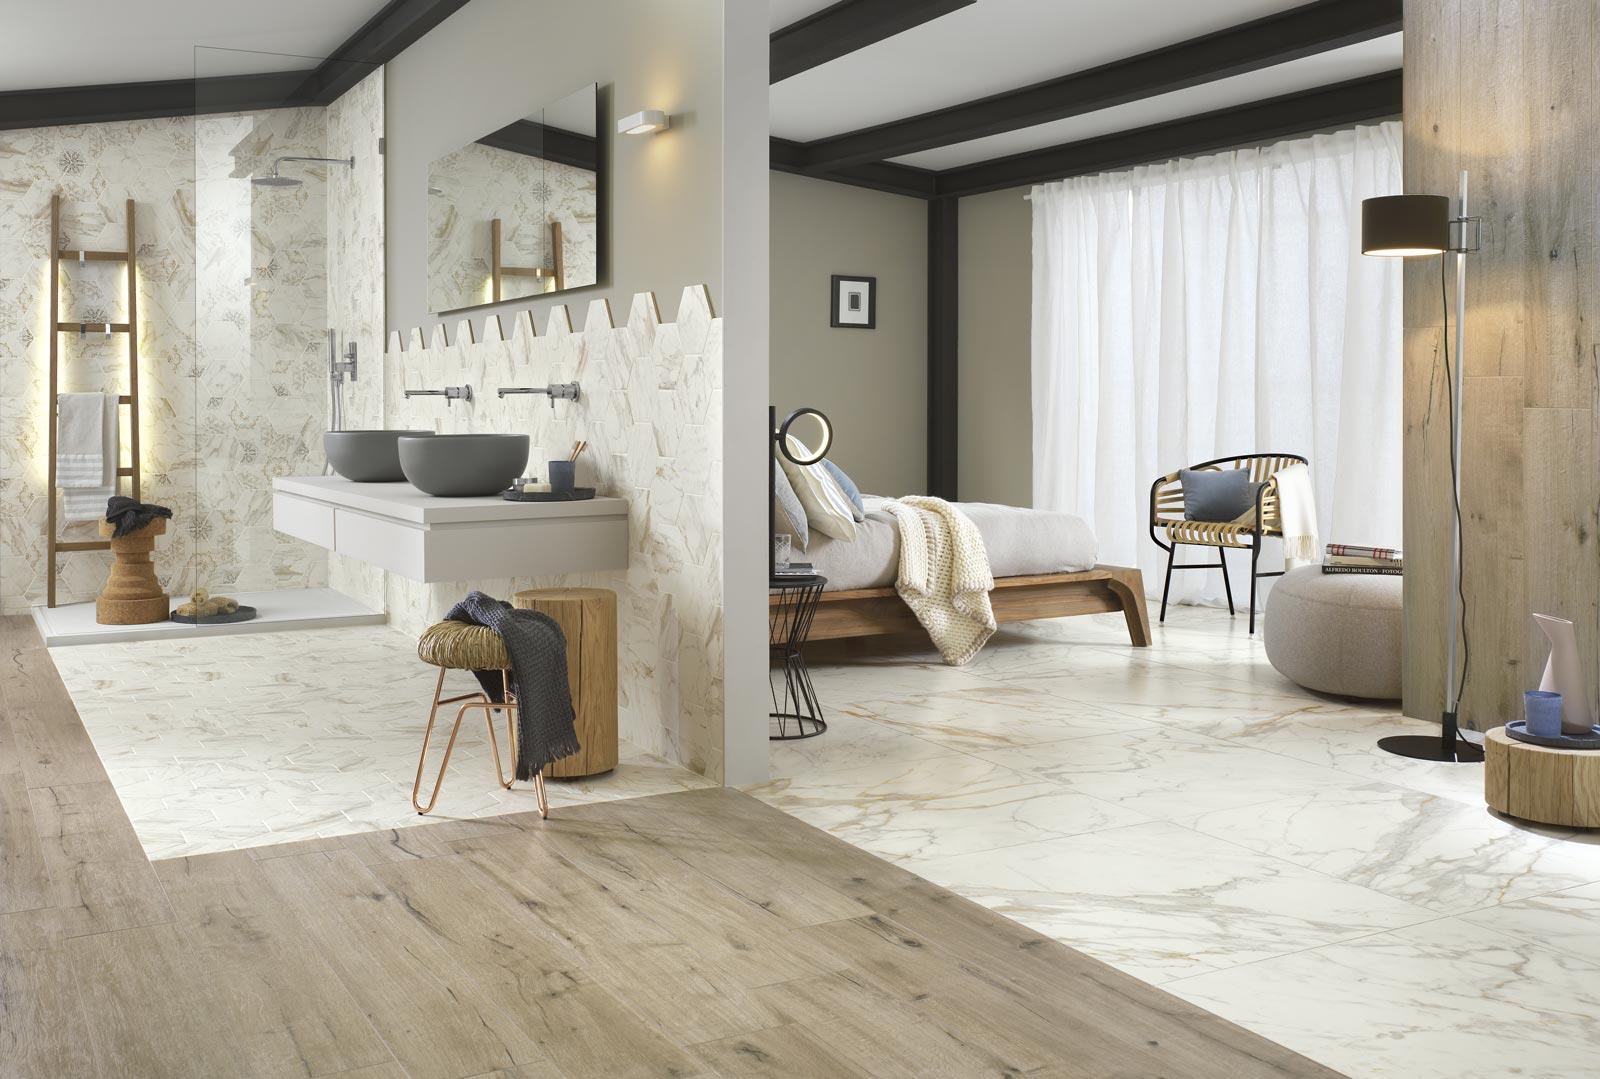 Badkamer In Slaapkamer : Luxe slaapkamer badkamer suite homease